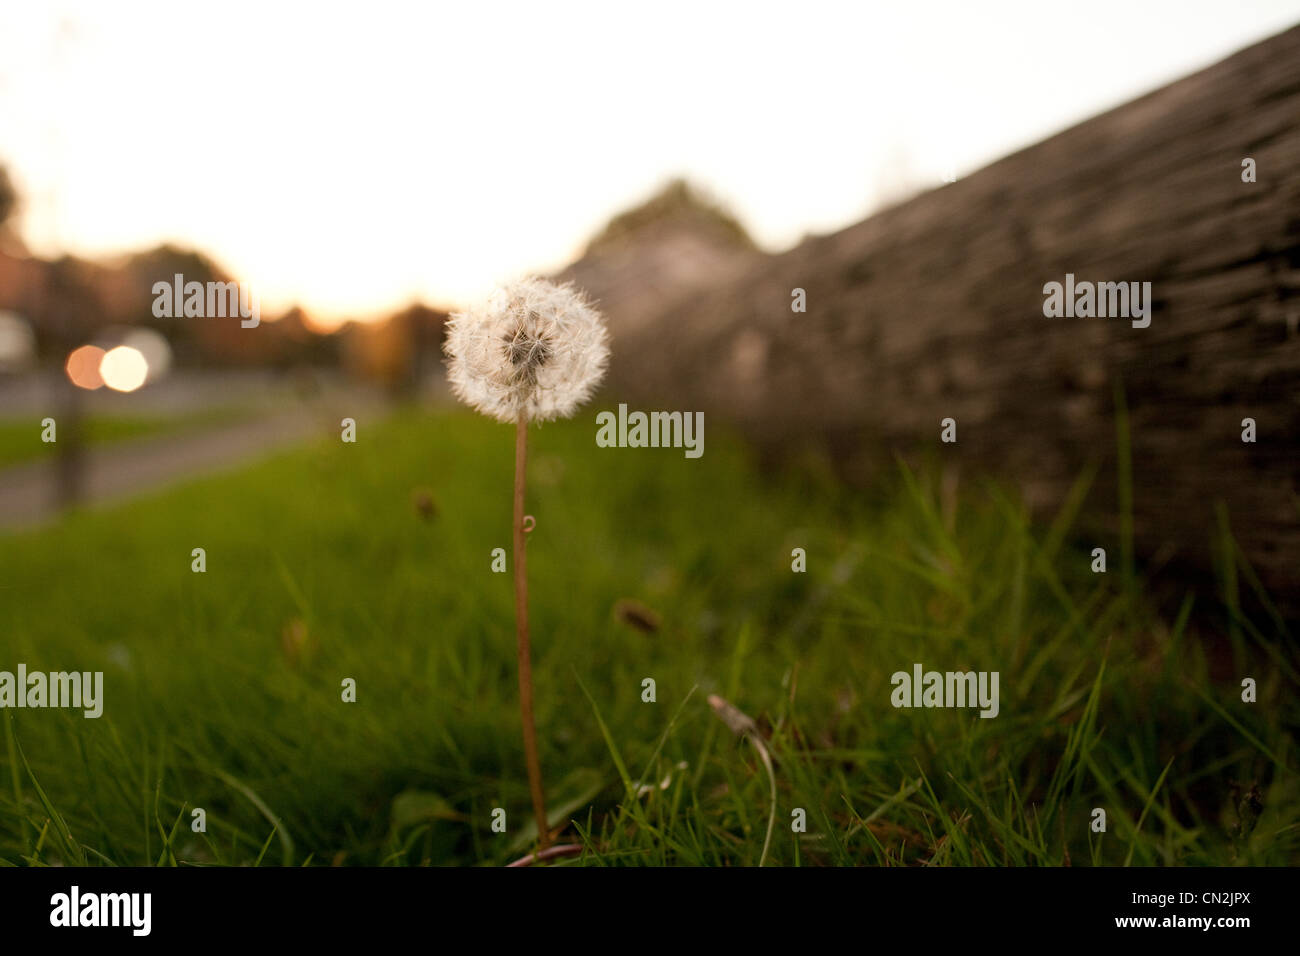 Dandelion clock, close up Stock Photo